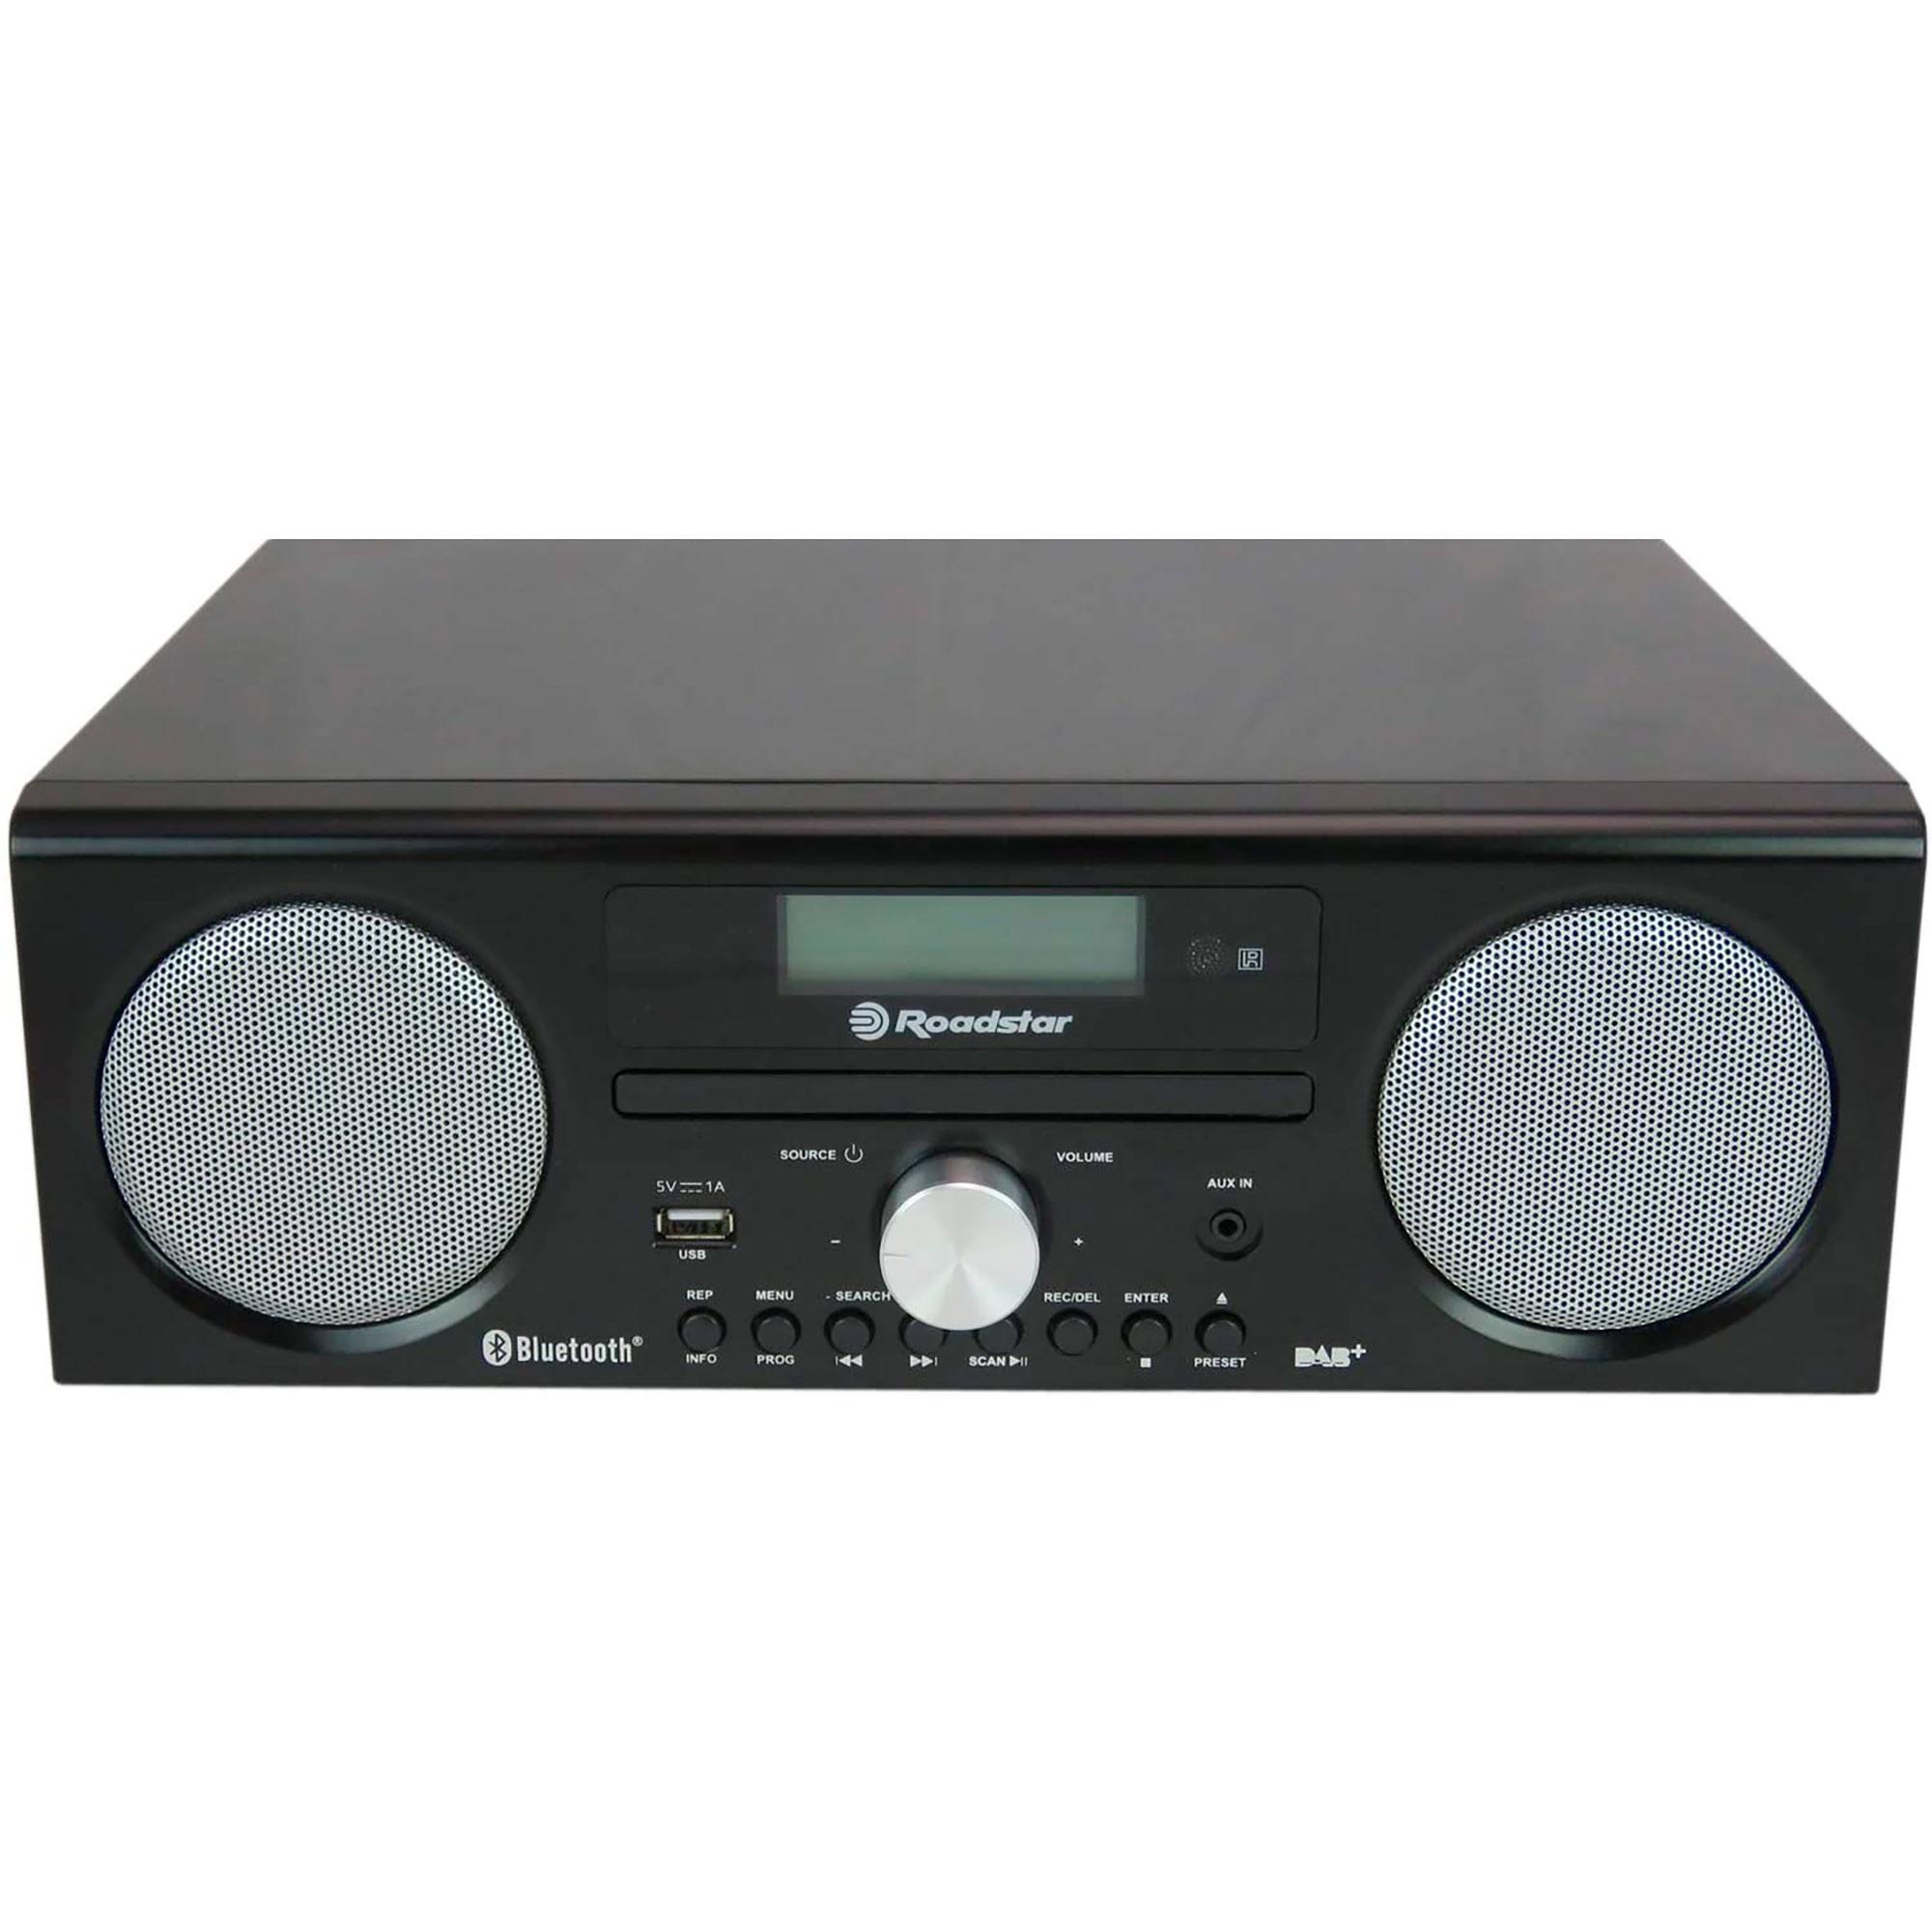 Roadstar HRA9DBT-BKL Radio Portátil DAB/DAB+/FM, Reproductor CD-MP3, Bluetooth, USB, AUX-IN, Grabador, Pantalla LCD, Mando a Distancia, Negro